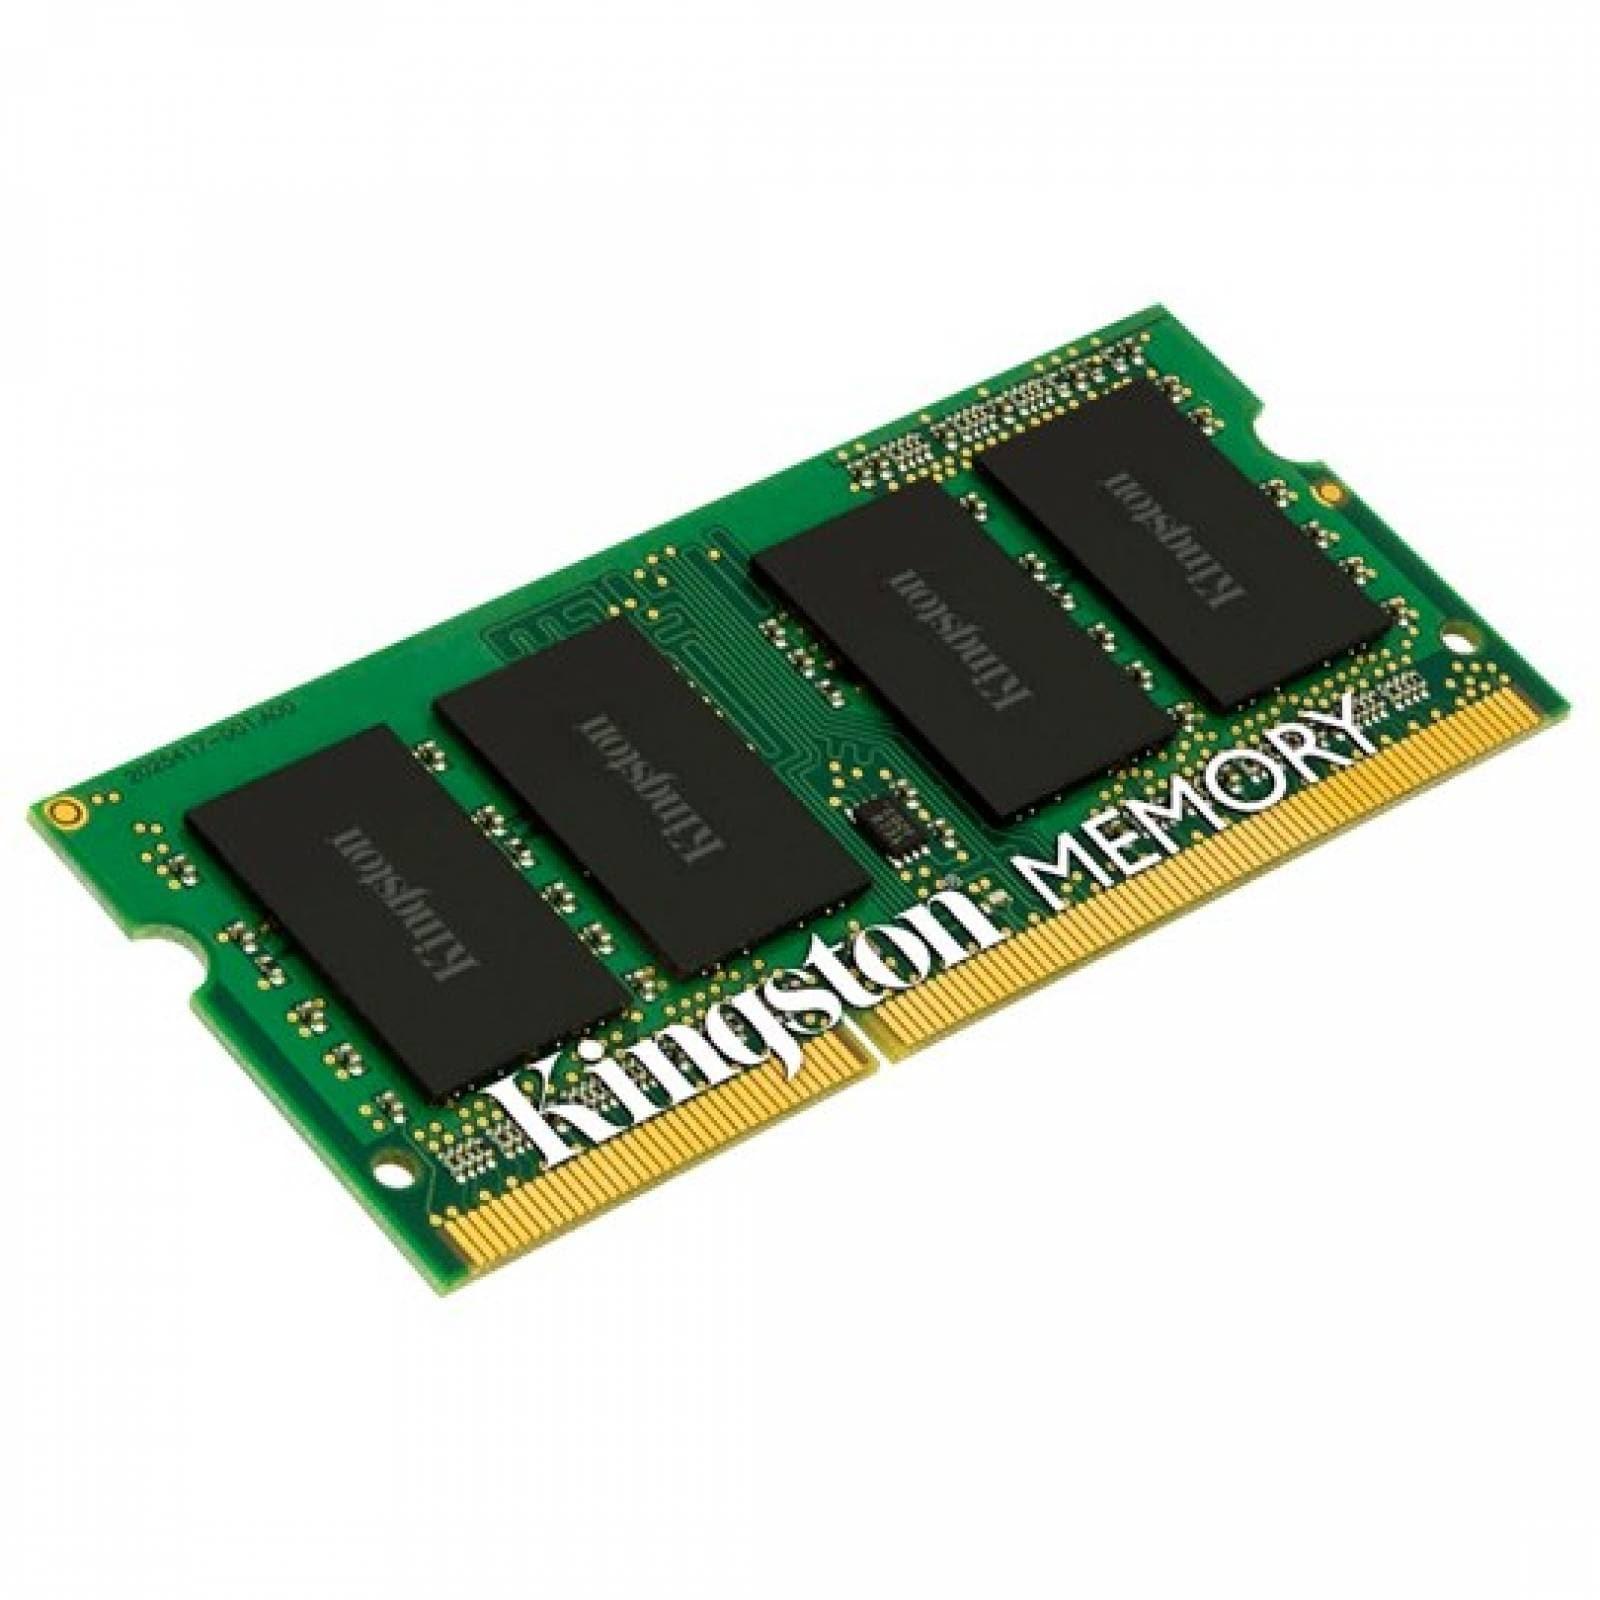 MEMORIA RAM TIPO GENERICA KINGSTON DE 8 GB EMBALAJE SODIMM TECNOLOGIA DDR3L VELOCIDAD DE 1600 MHZ